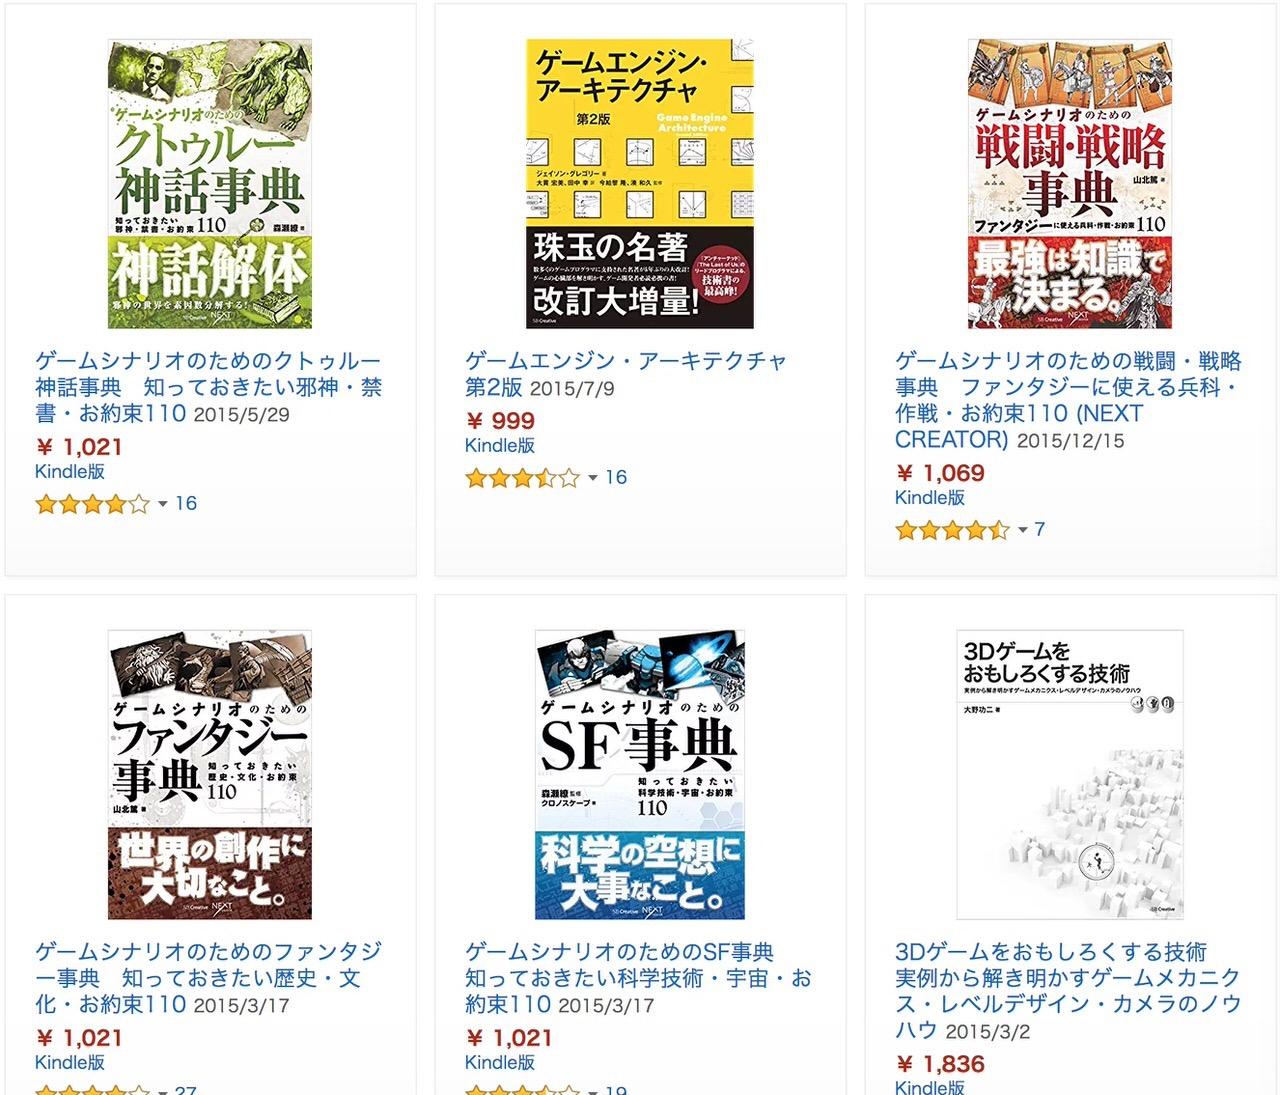 【Kindleセール】50%OFF以上「夏のゲーム開発本フェア」開催中(9/6まで)